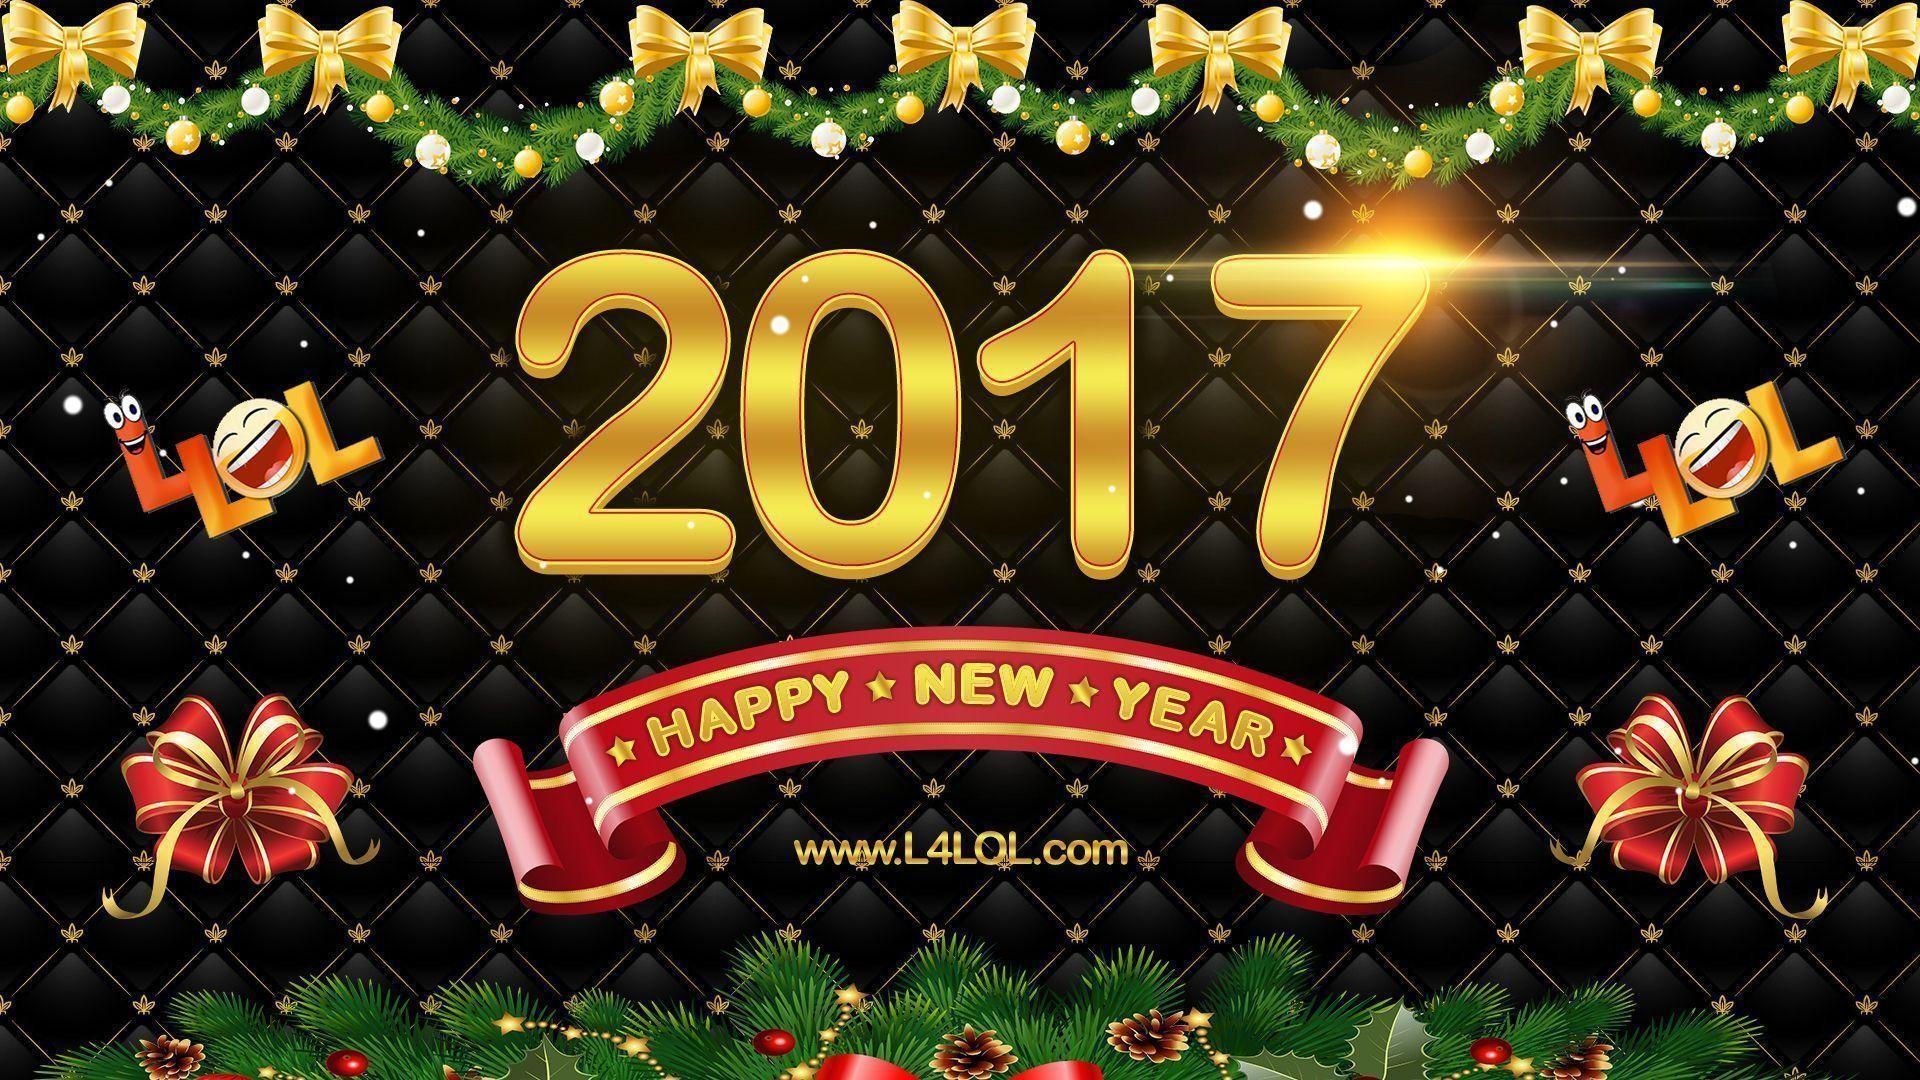 Happy New Year 2017 Wallpaper